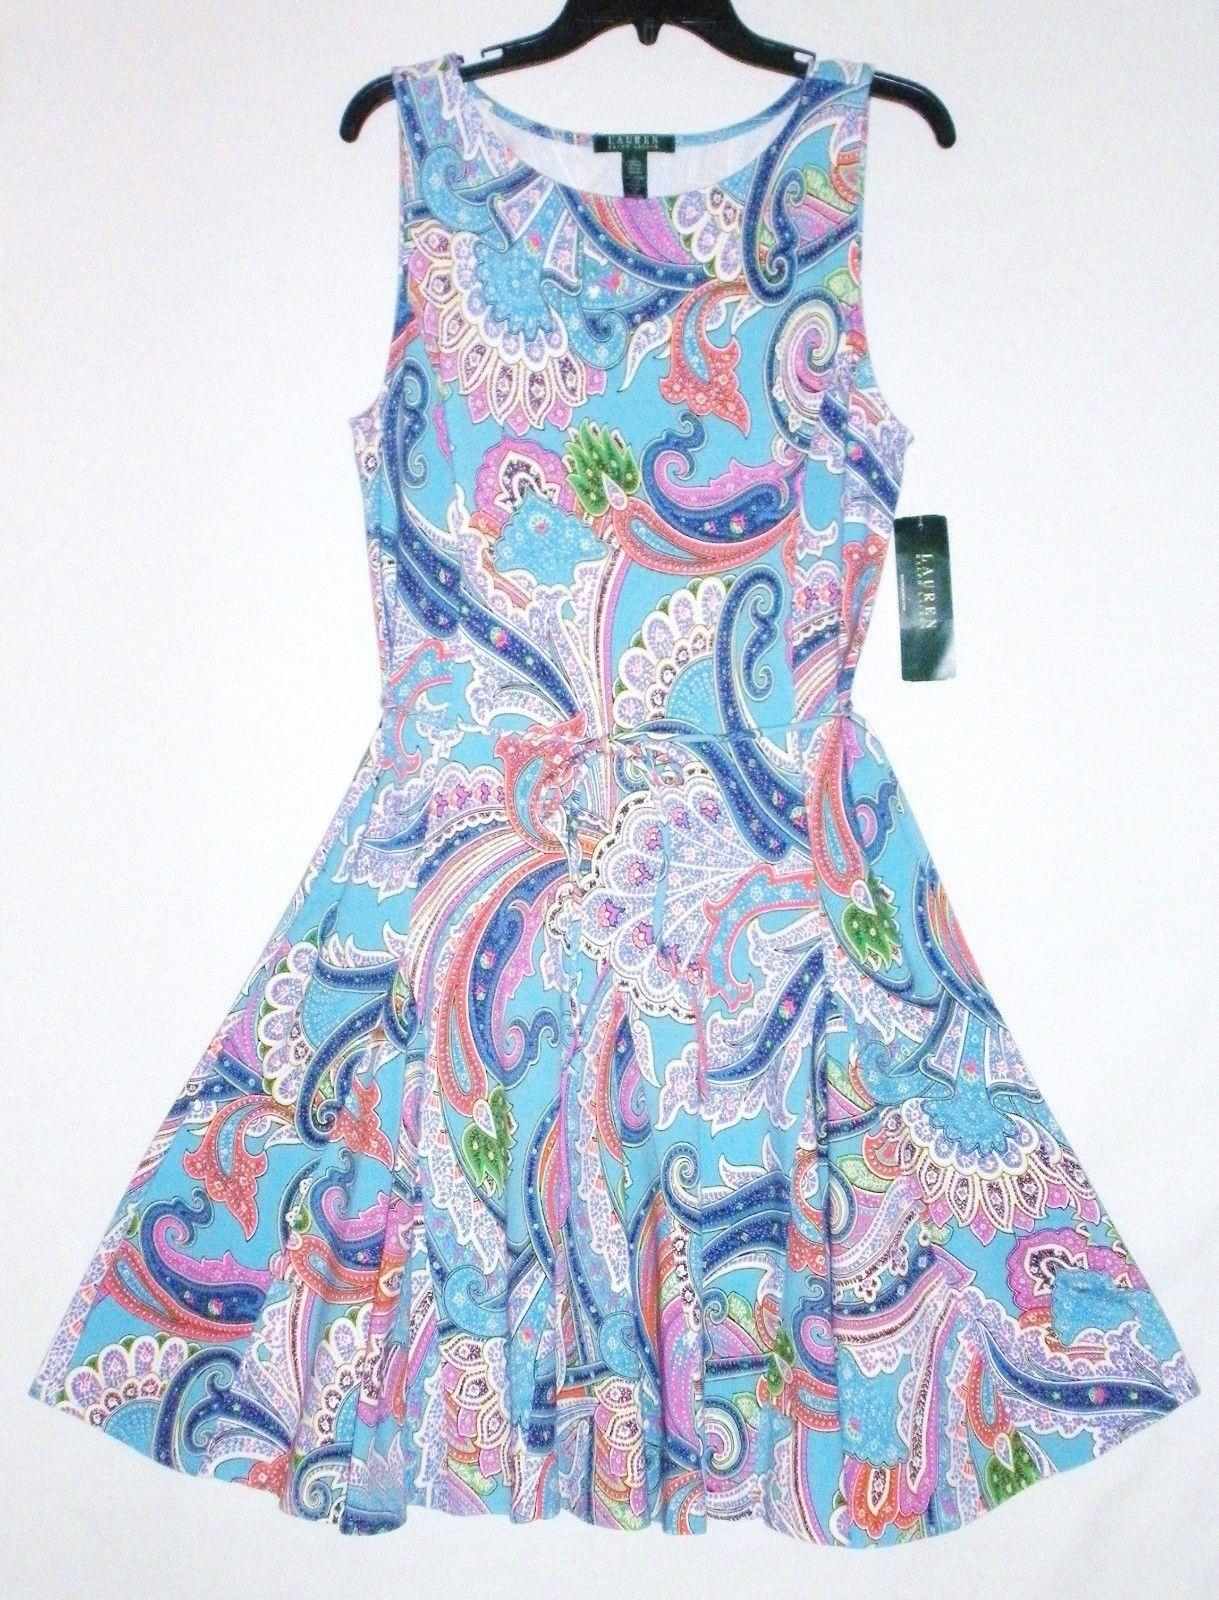 NWT MSRP  LAUREN RALPH LAUREN Paisley Knit Dress, Blau MultiFarbe, S  M   L